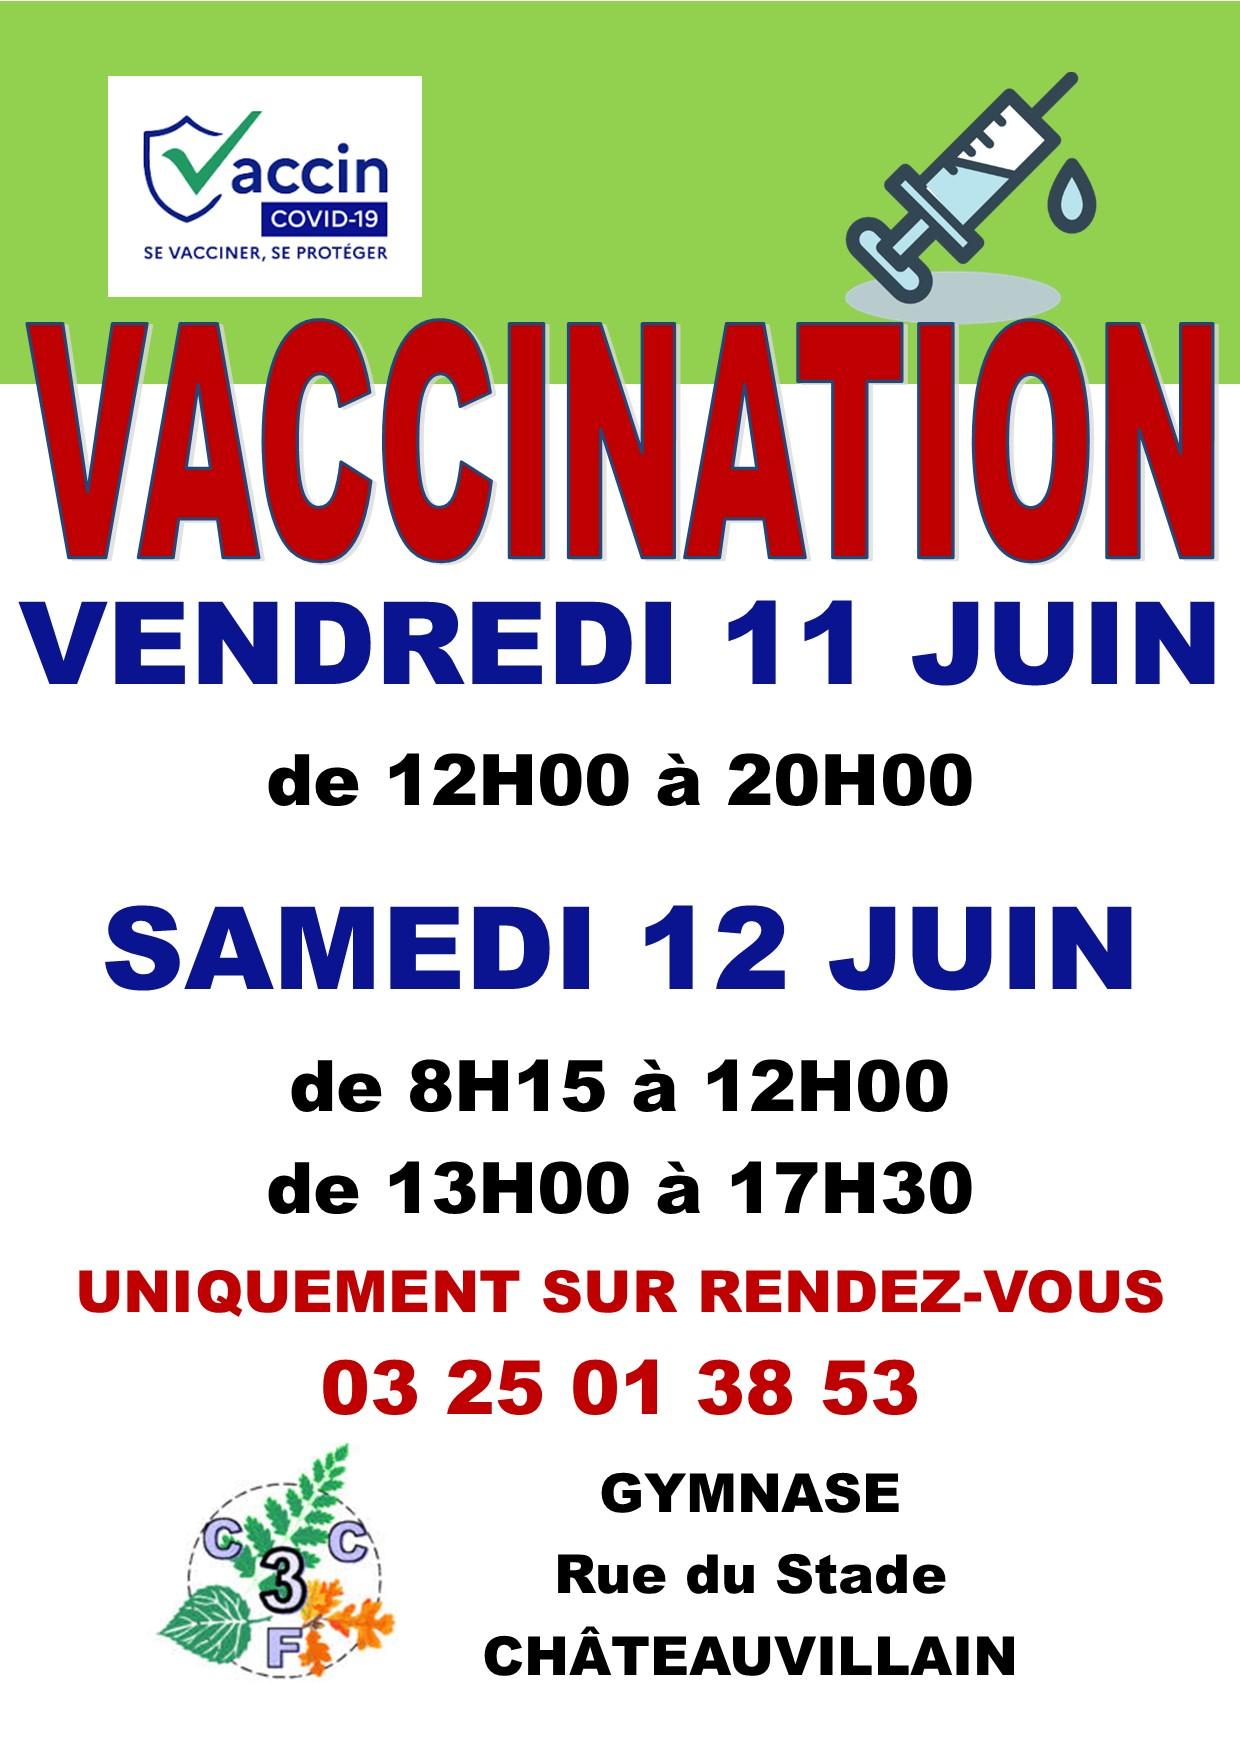 Vaccination à Châteauvillain